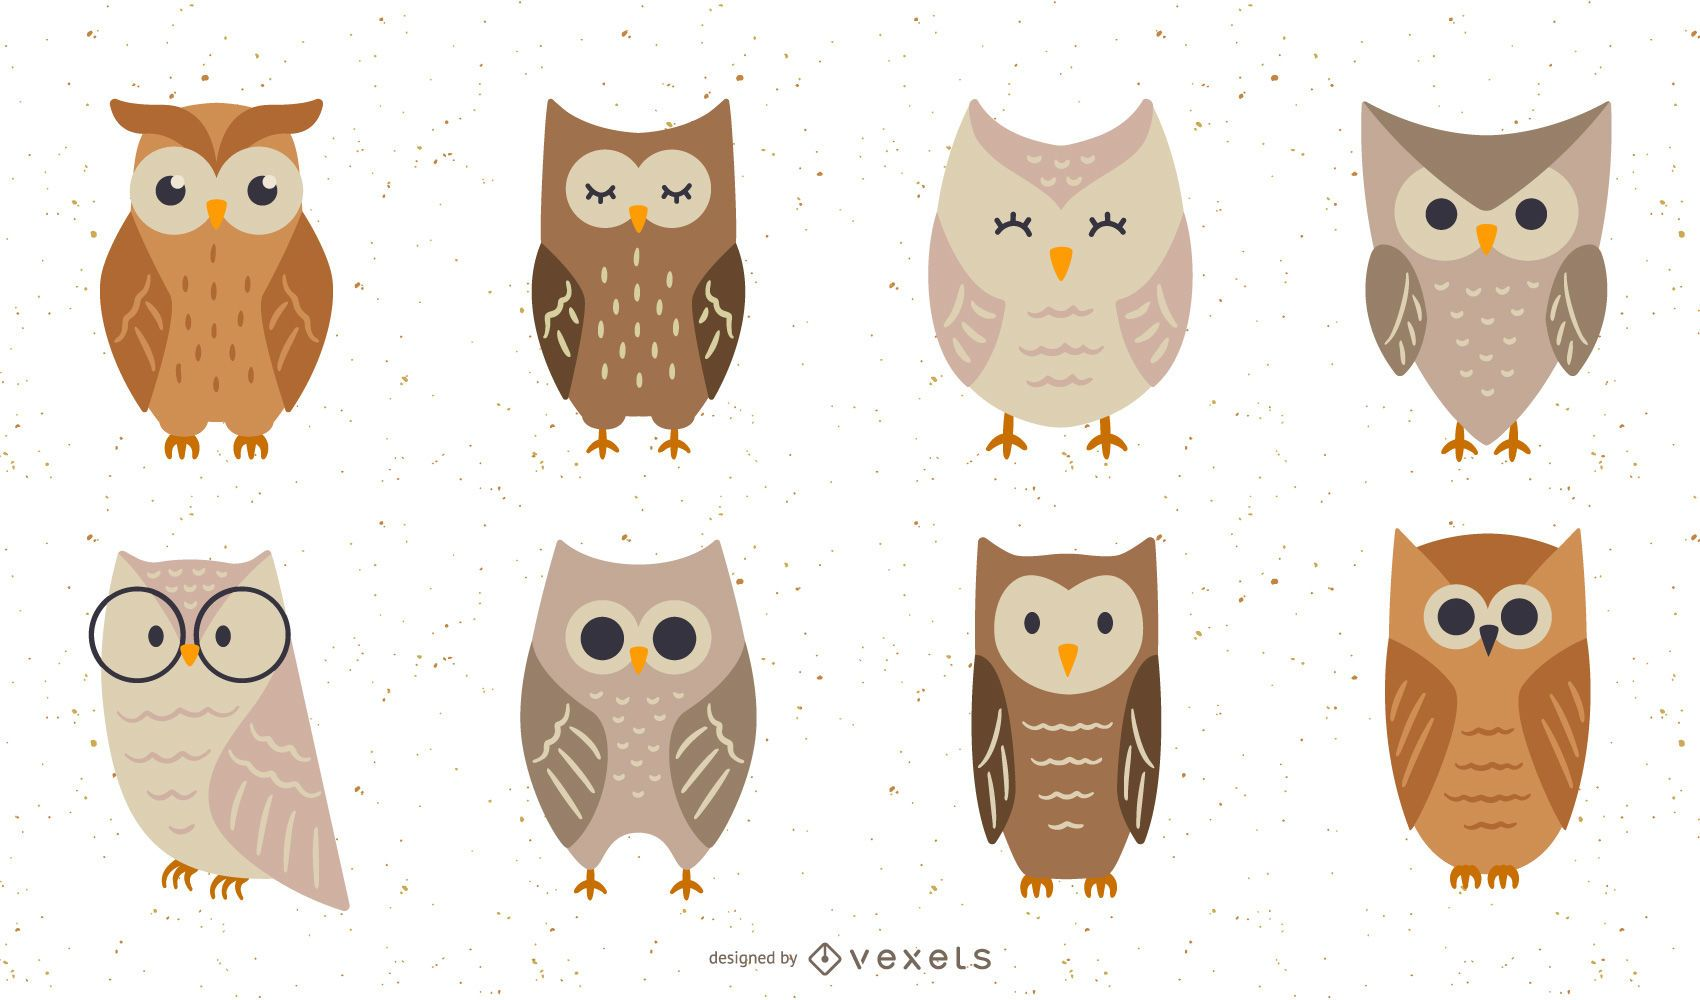 Owls flat illustration set